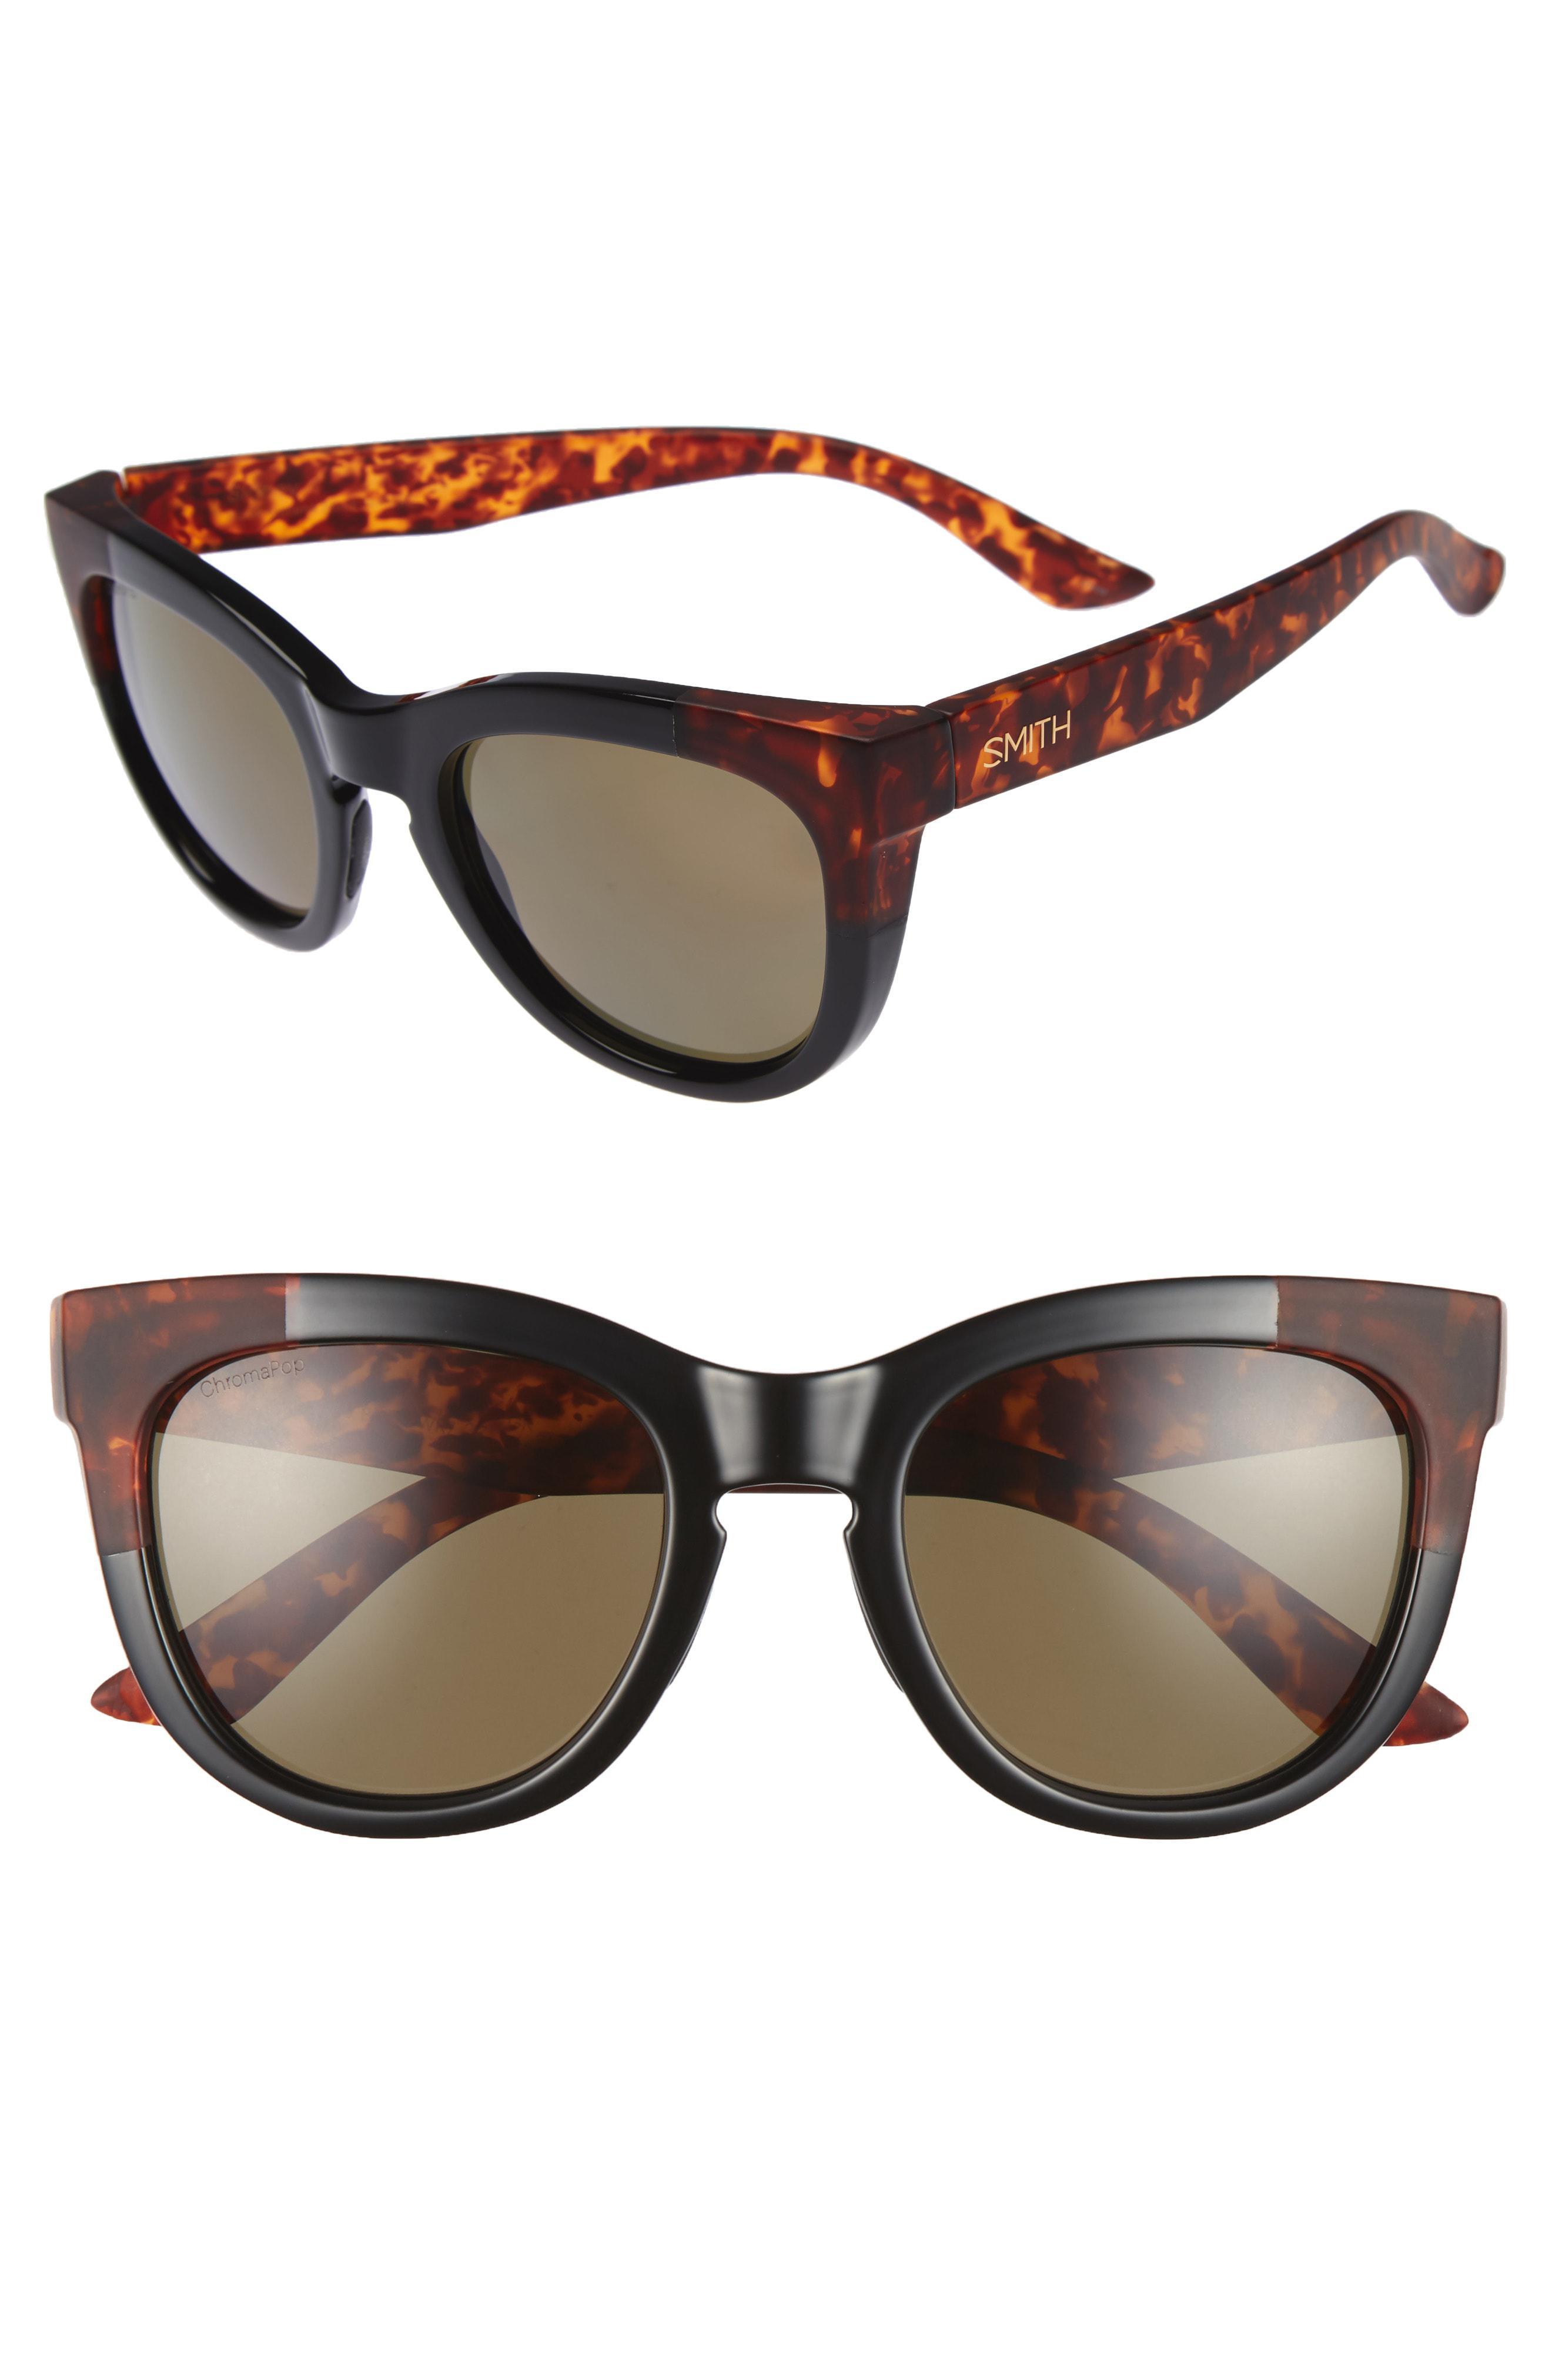 49e50369ad Smith - Black  sidney  55mm Polarized Sunglasses - Lyst. View fullscreen